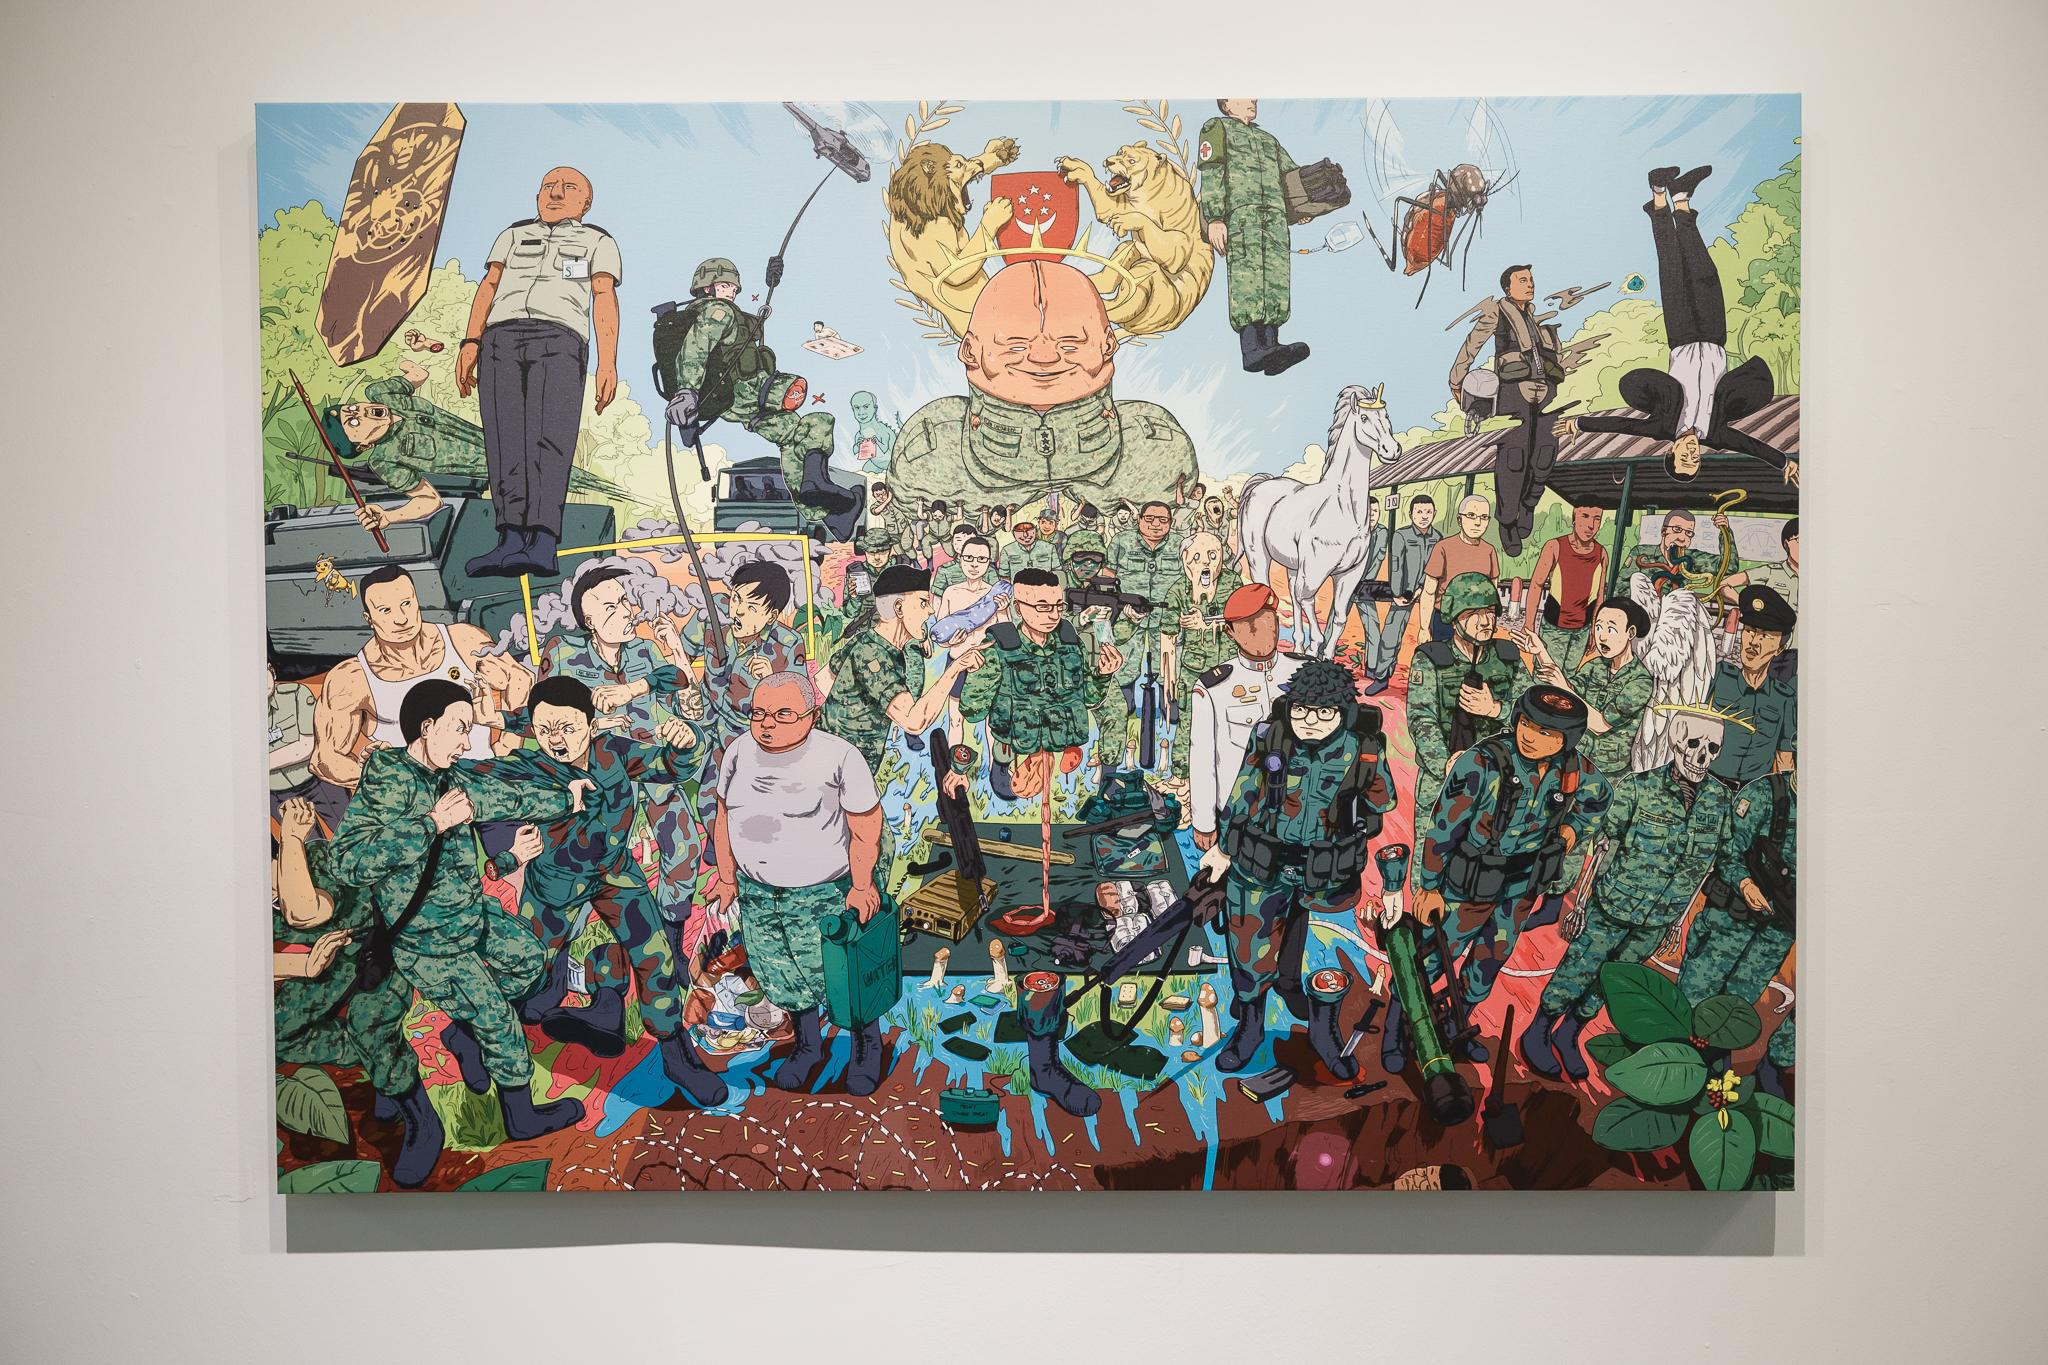 Dan Wong, Ennesseff (NSF), 2018, Digital print on archival canvas, 100 x 140 cm